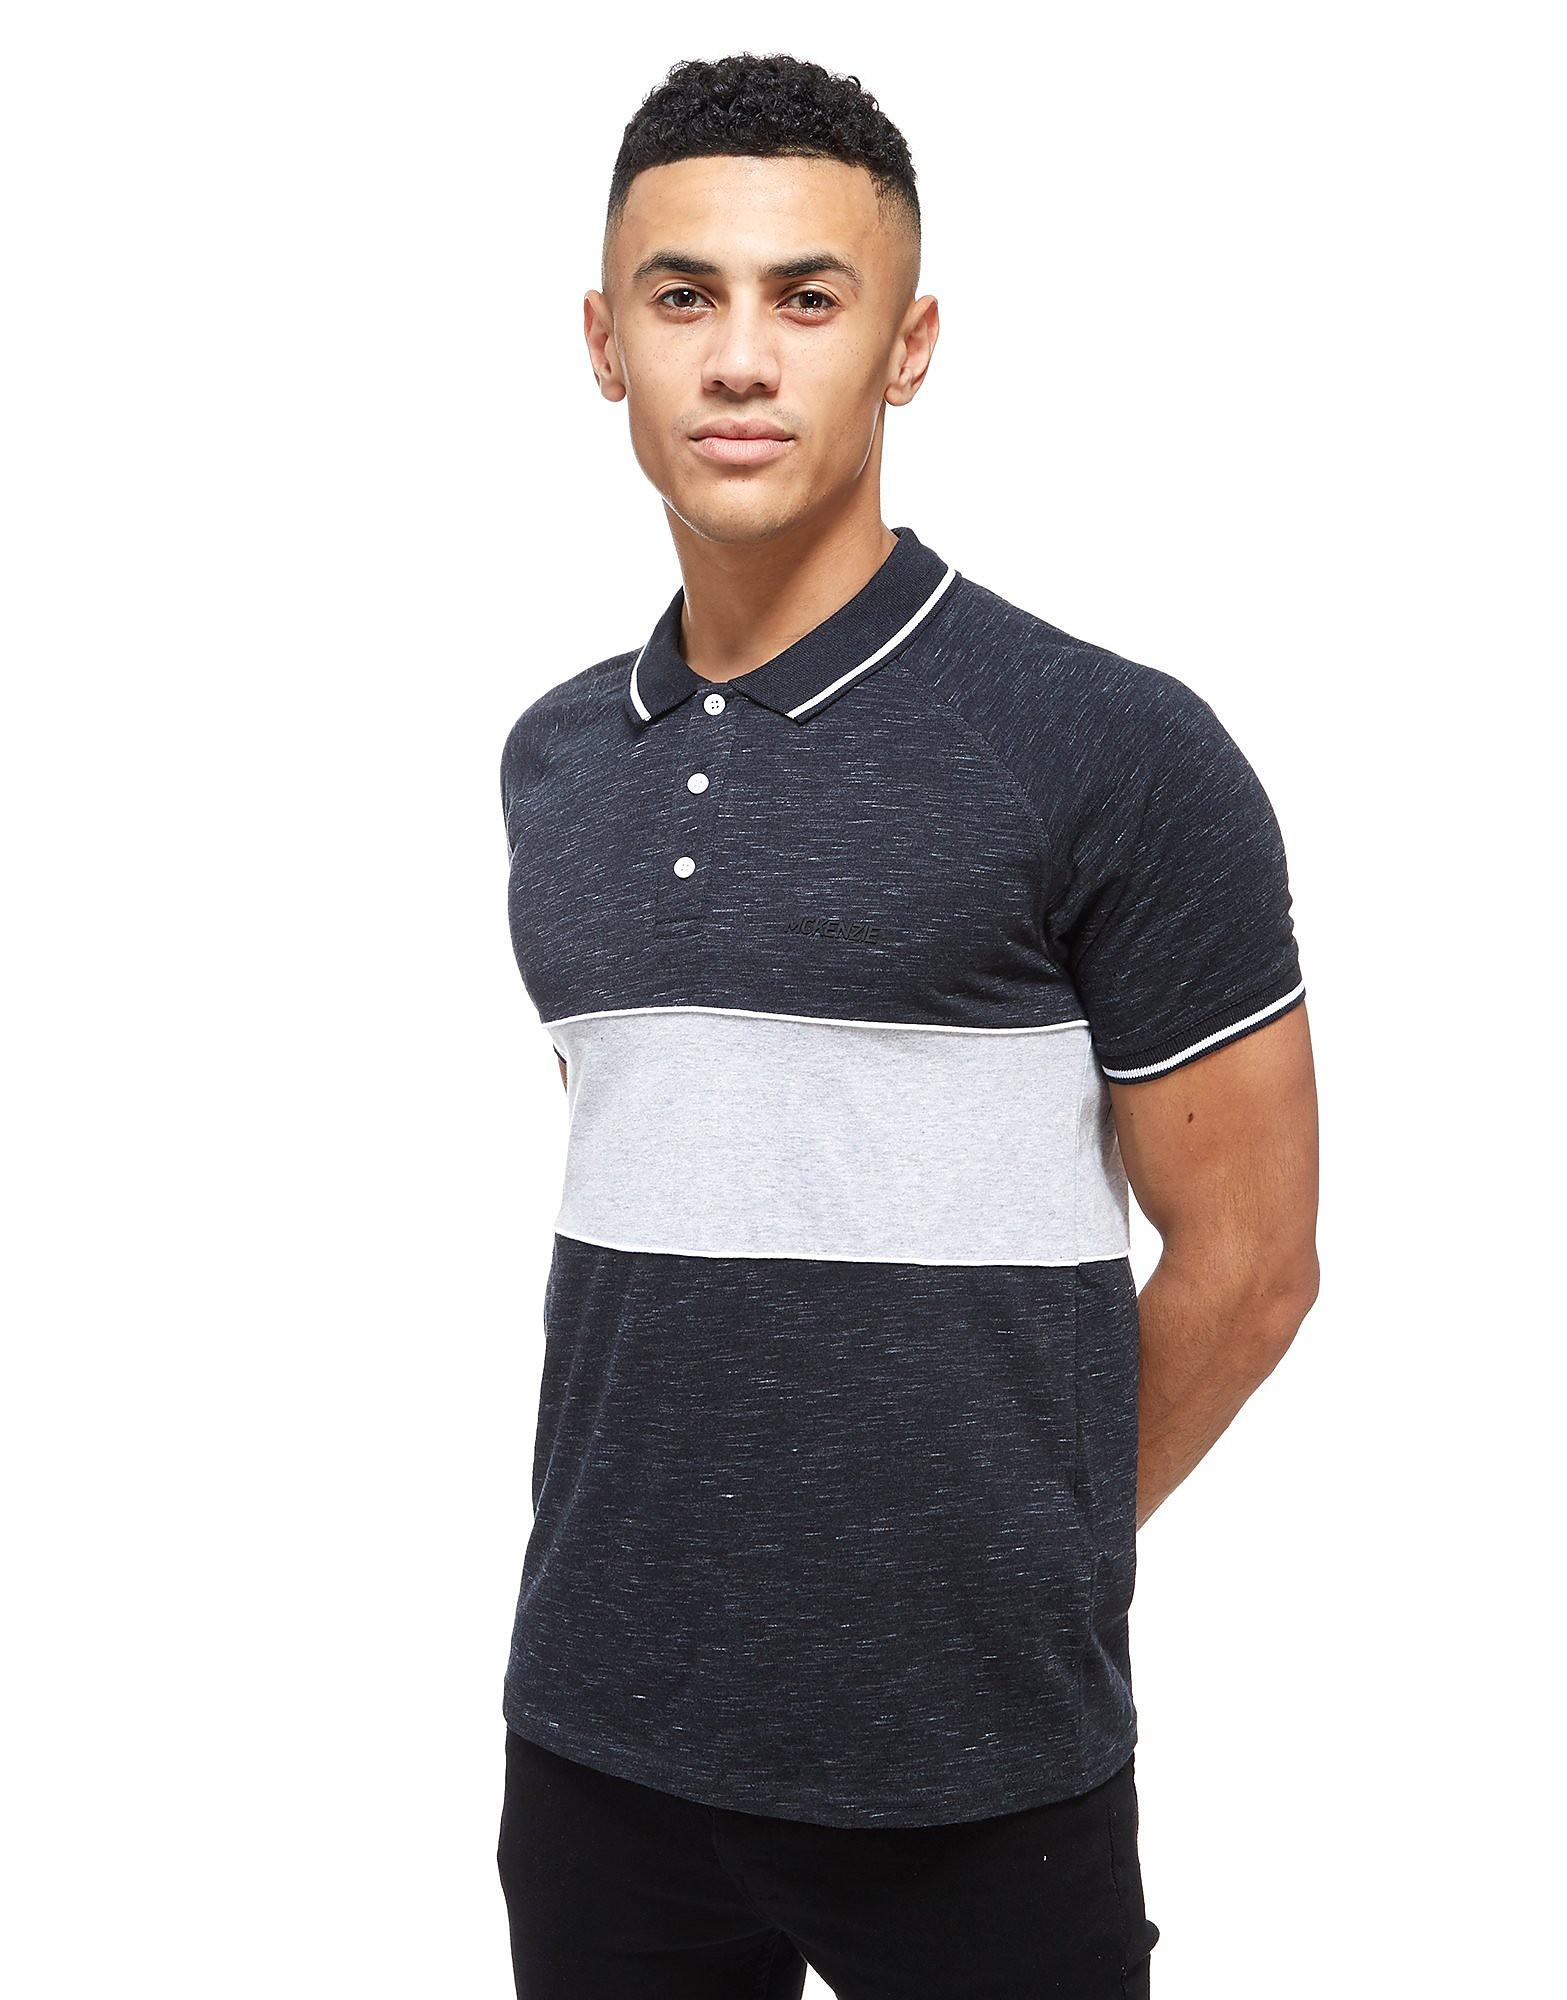 McKenzie Chimera Polo Shirt